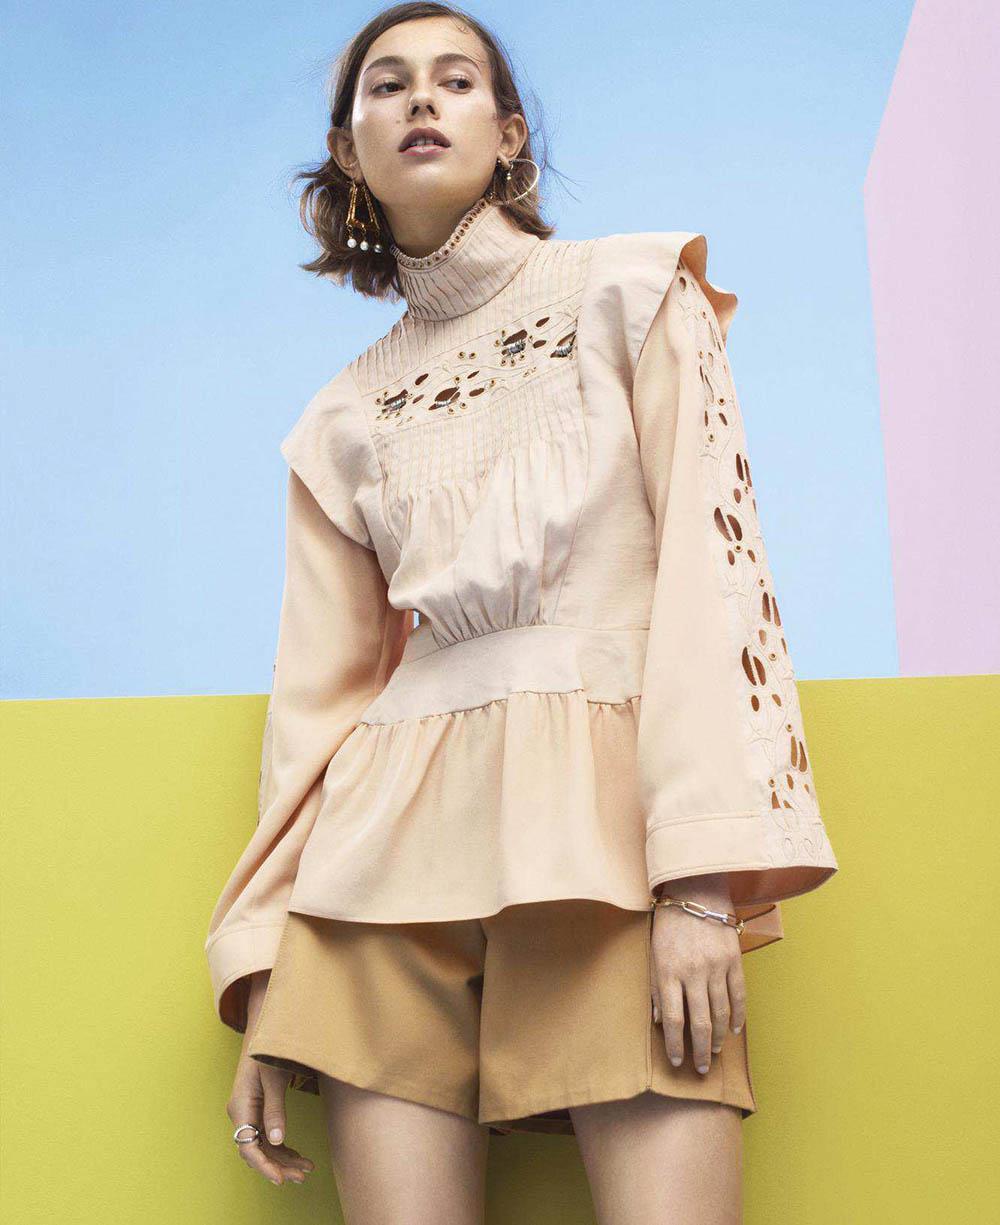 Mali Koopman by Sebastian Kim for Harper's Bazaar US April 2018